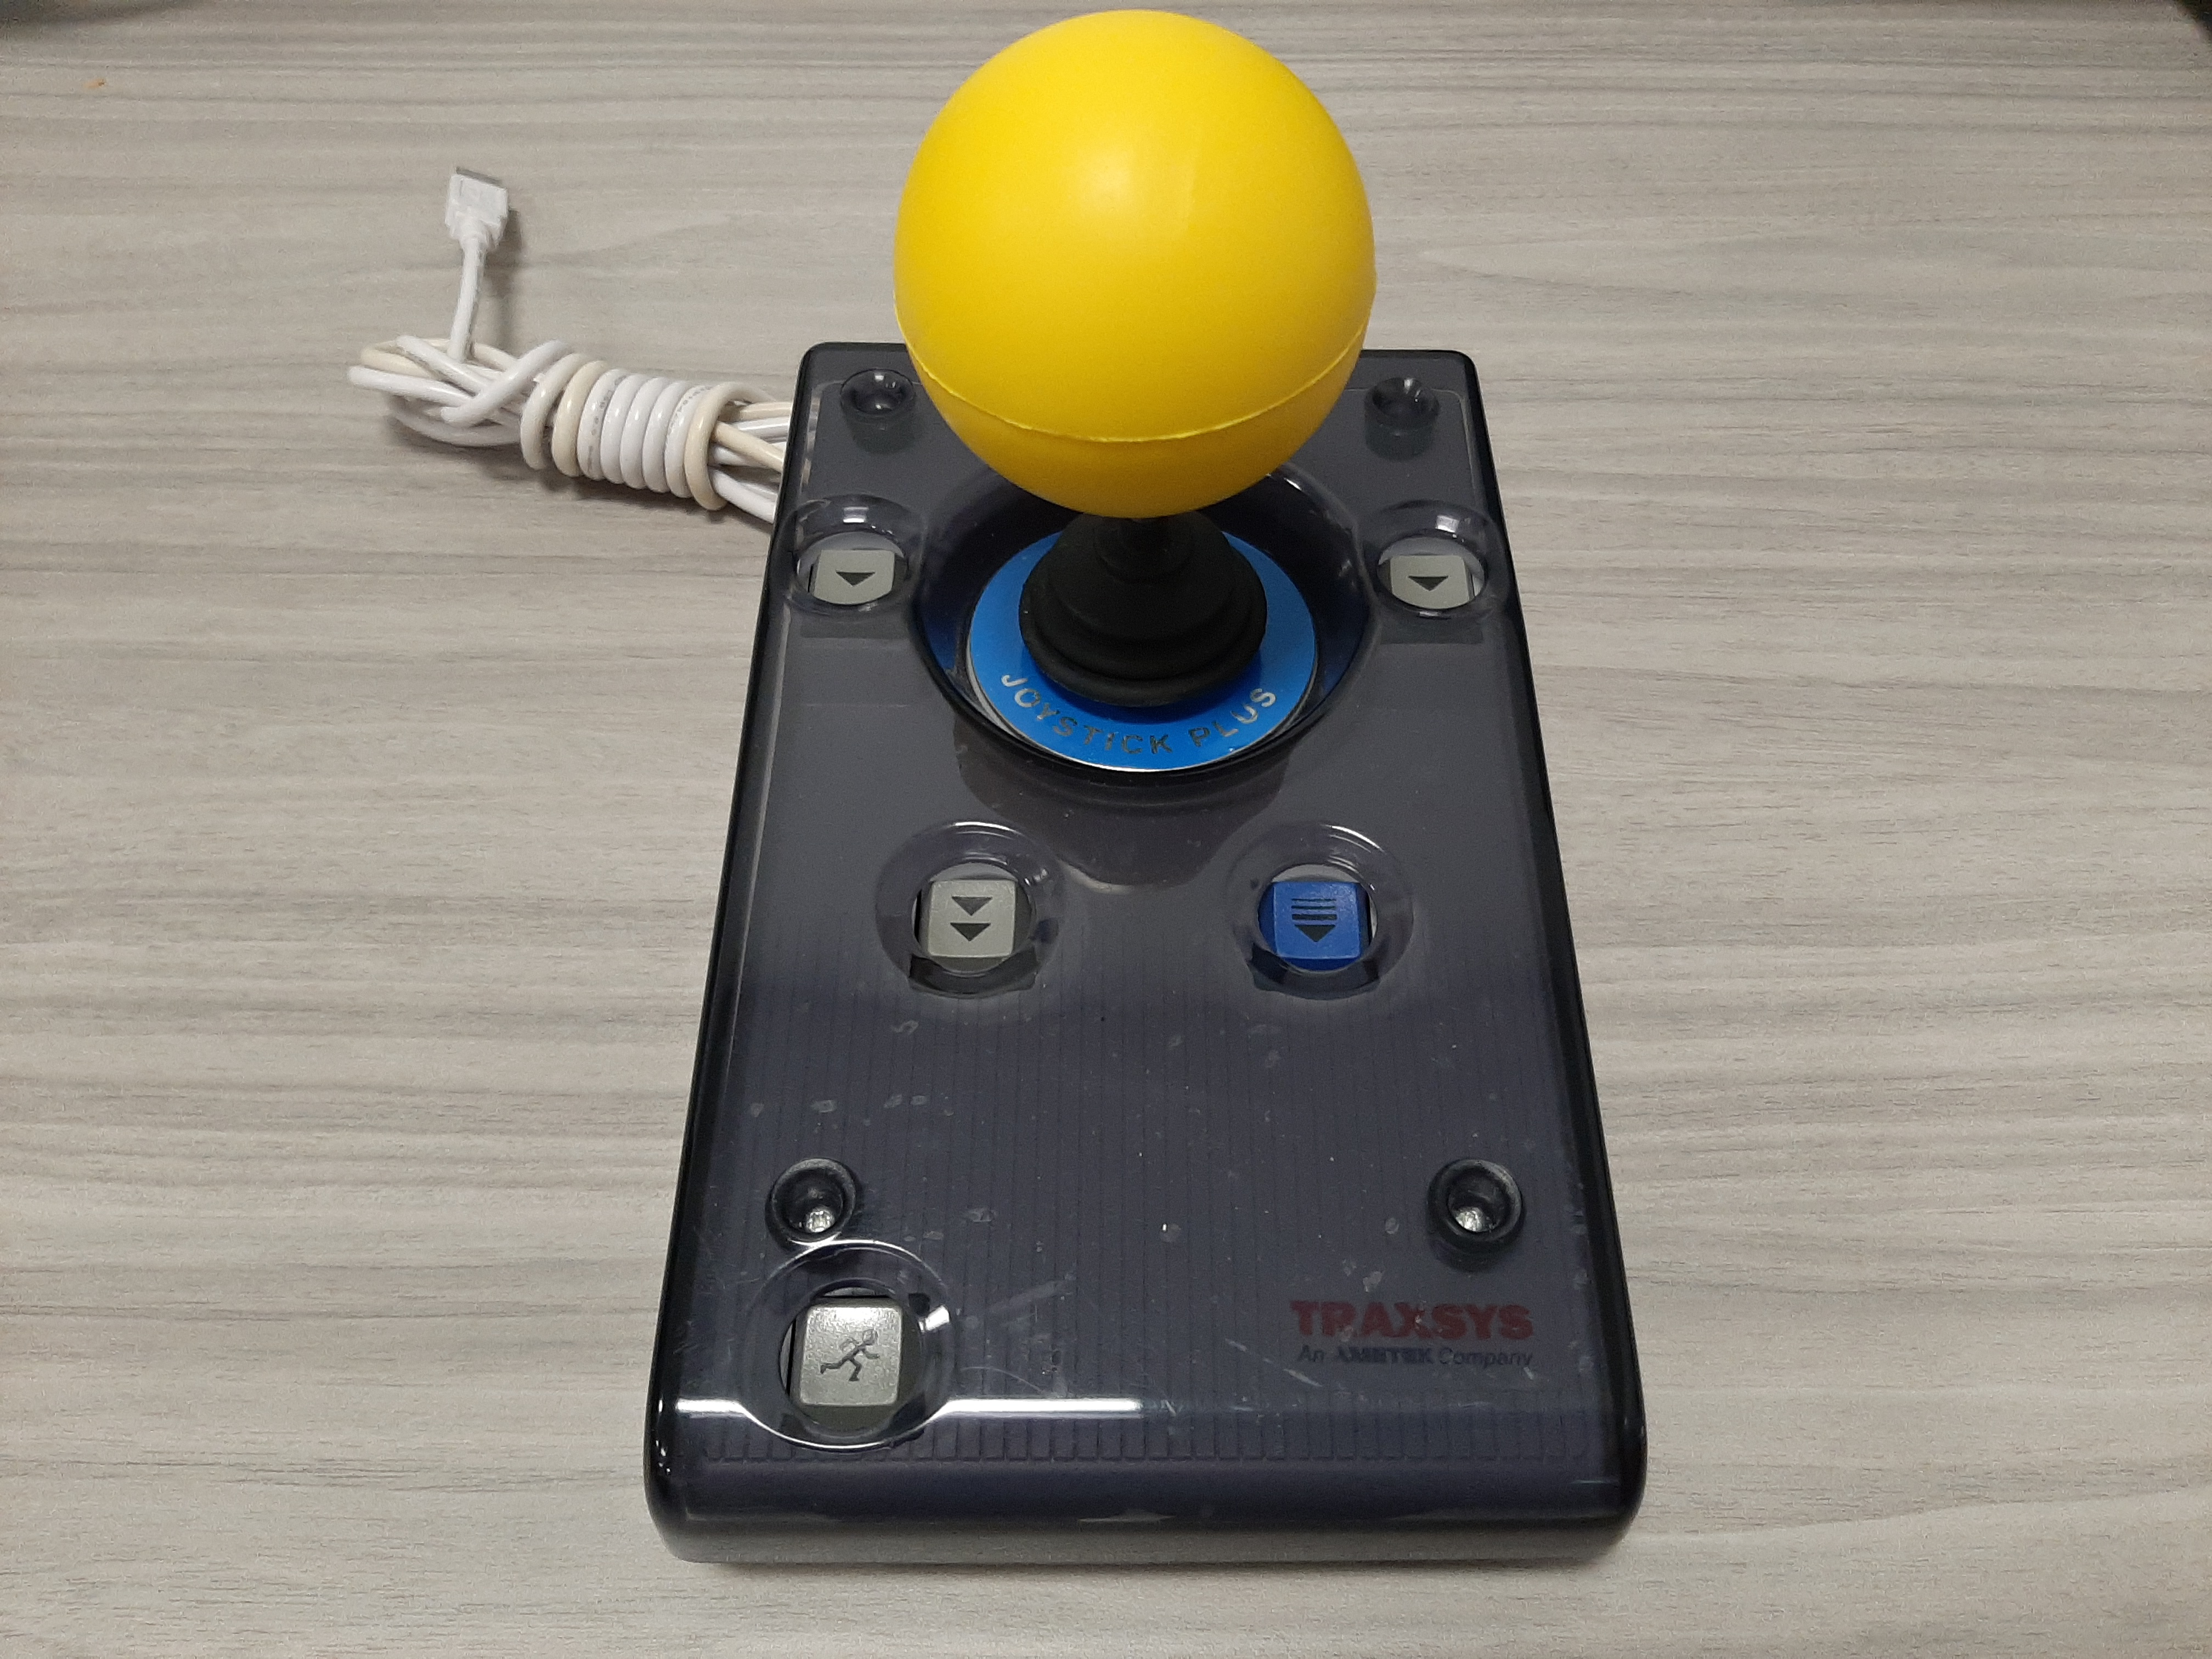 Traxsys Joystick Plus Mouse